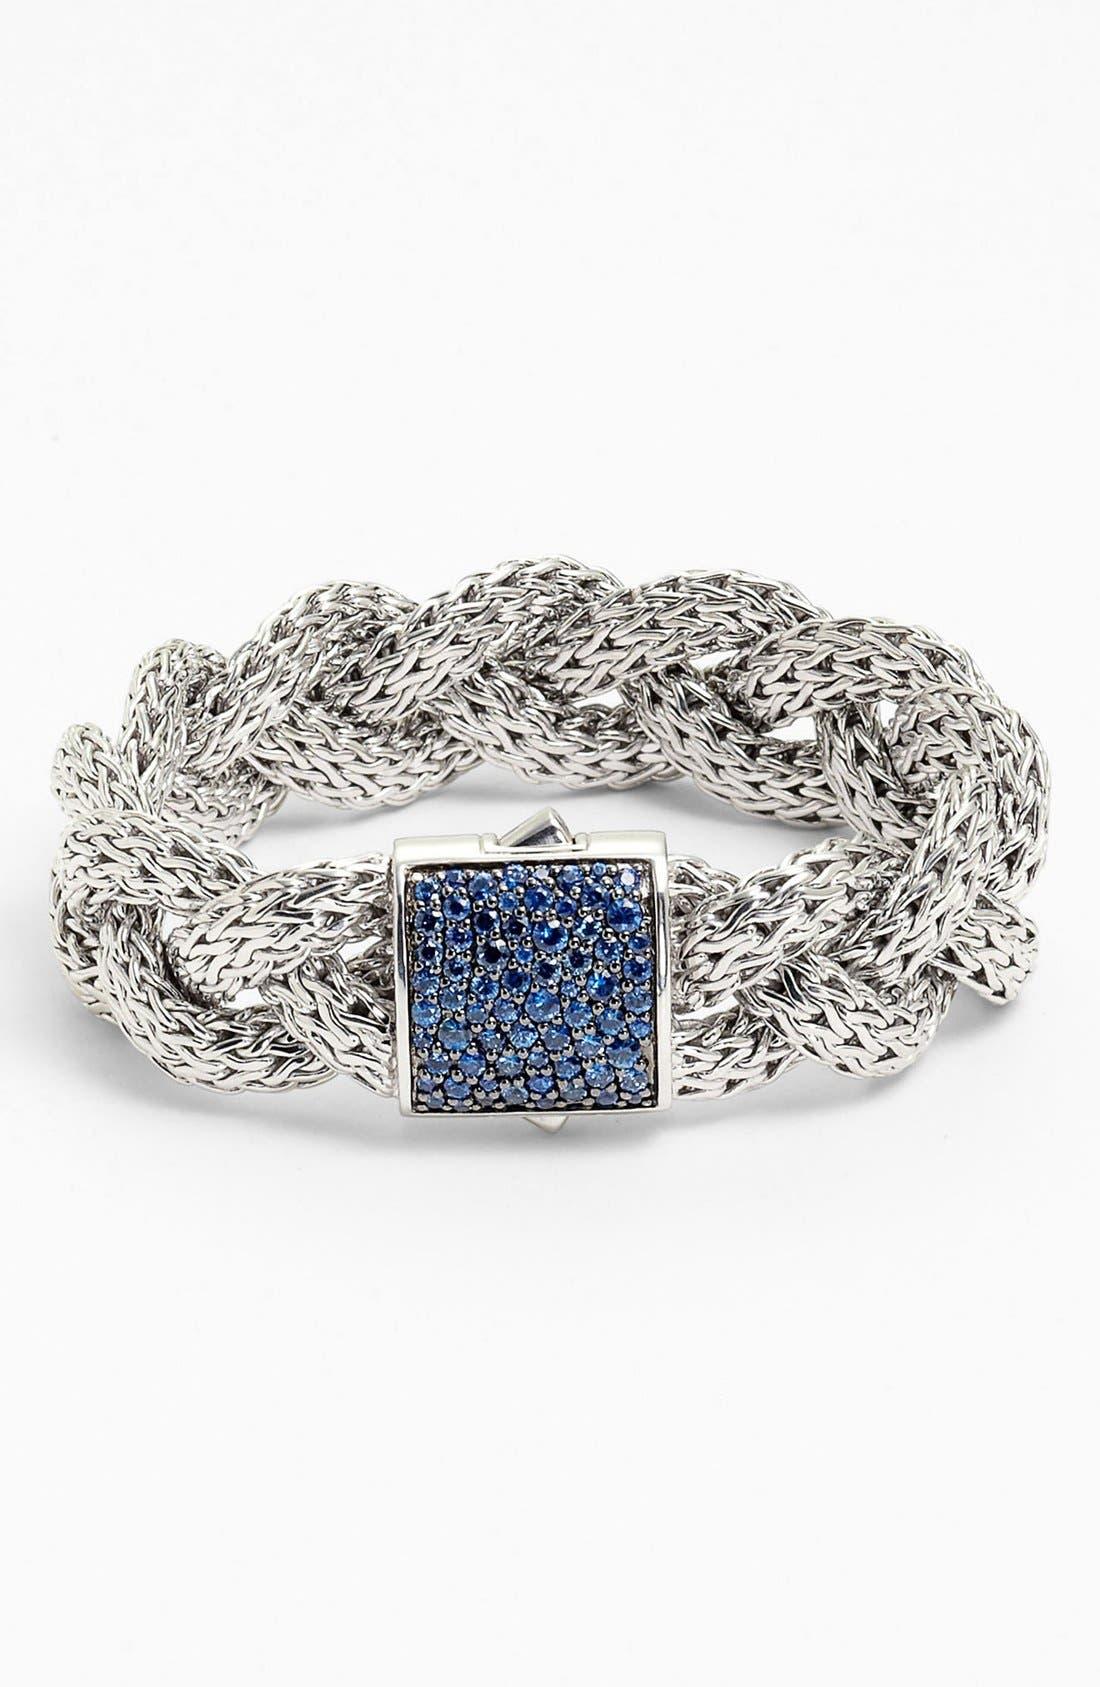 Alternate Image 1 Selected - John Hardy 'Classic Chain' Large Braided Bracelet